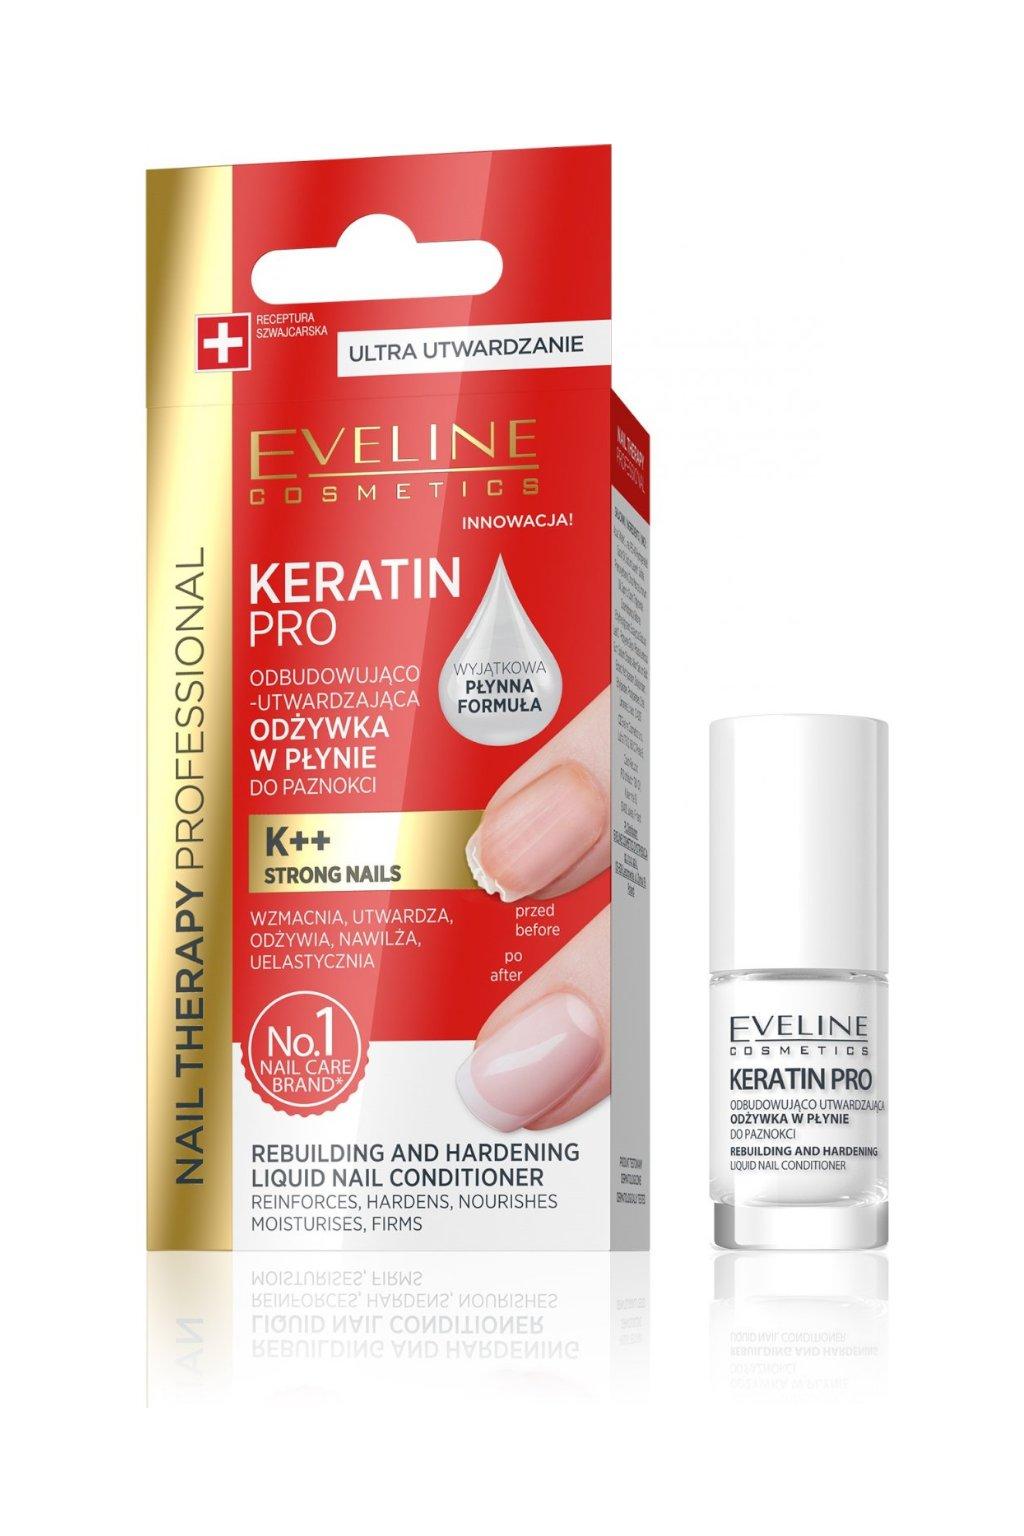 Eveline Cosmetics Keratin Pro Nail Conditioner